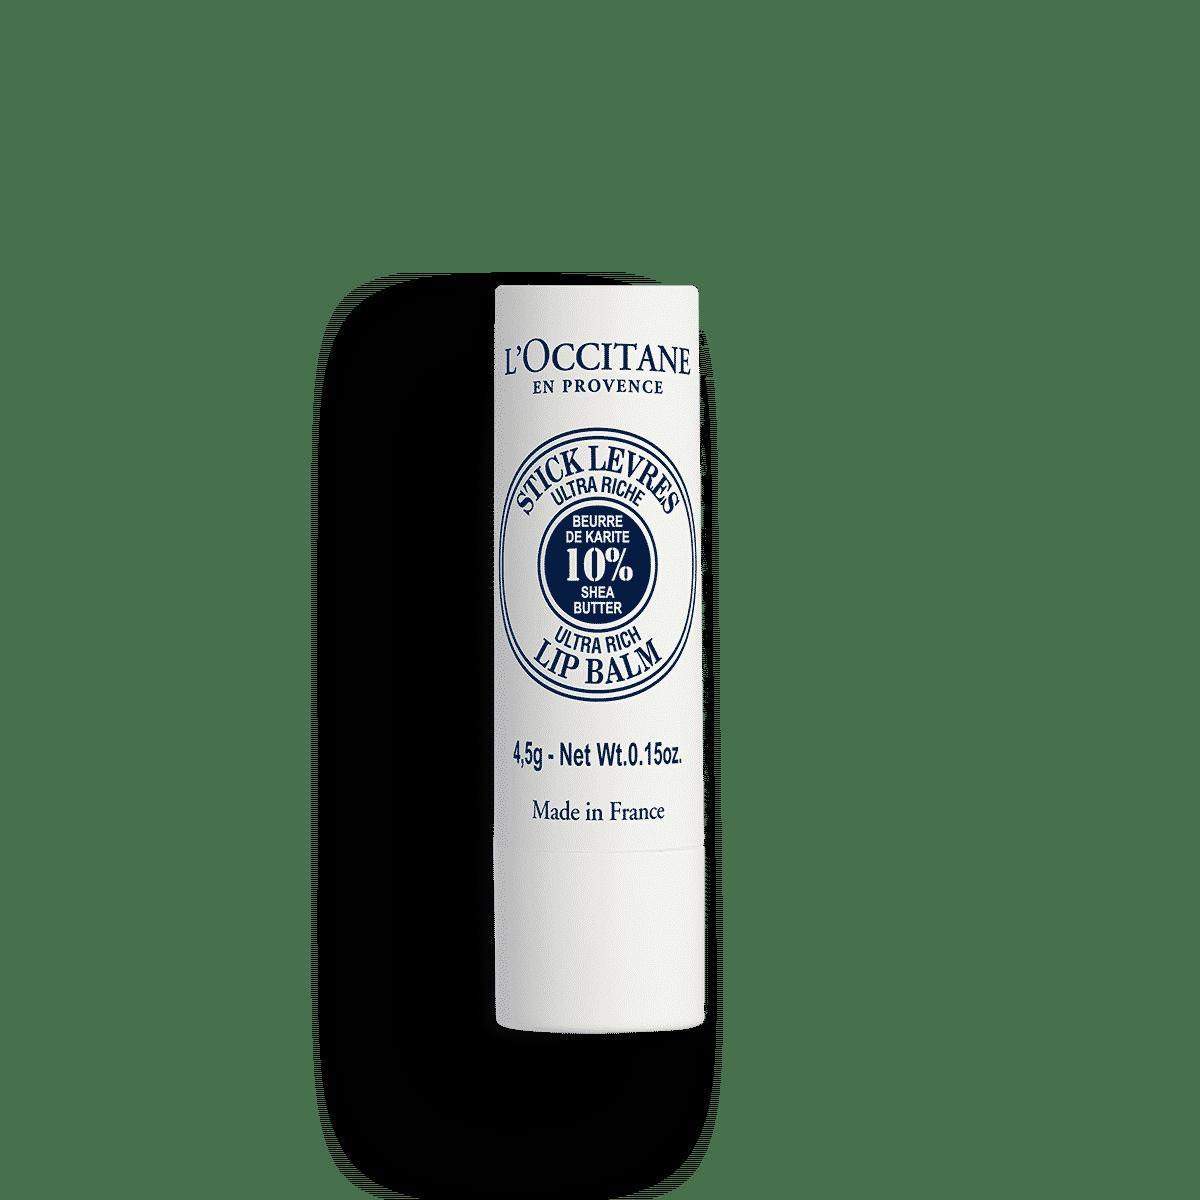 LOccitane-Shea-Butter-Lip-Balm